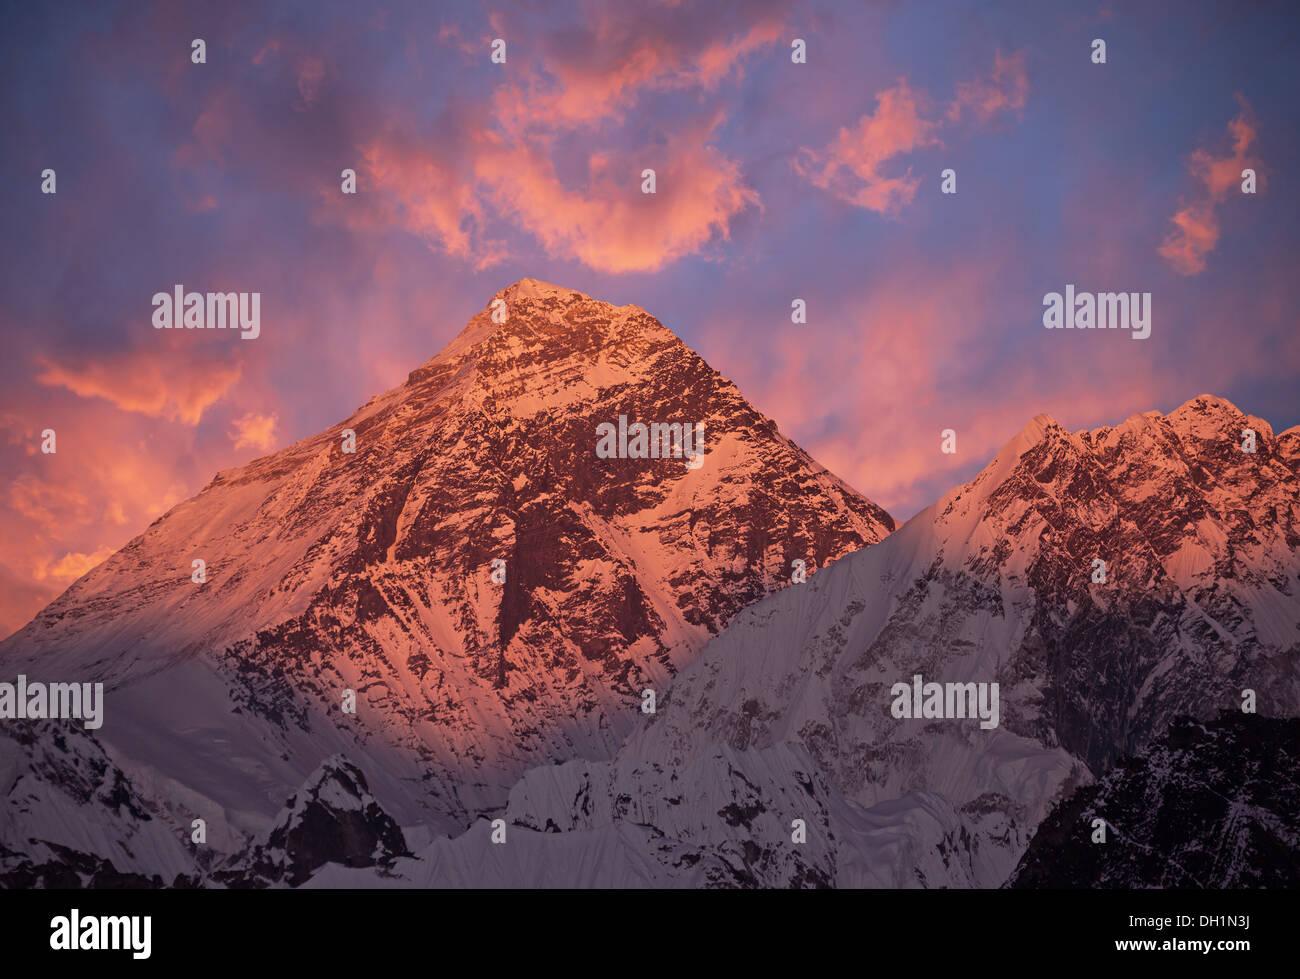 Mount Everest (8848 m) at sunset. Nepal, Himalayas. - Stock Image